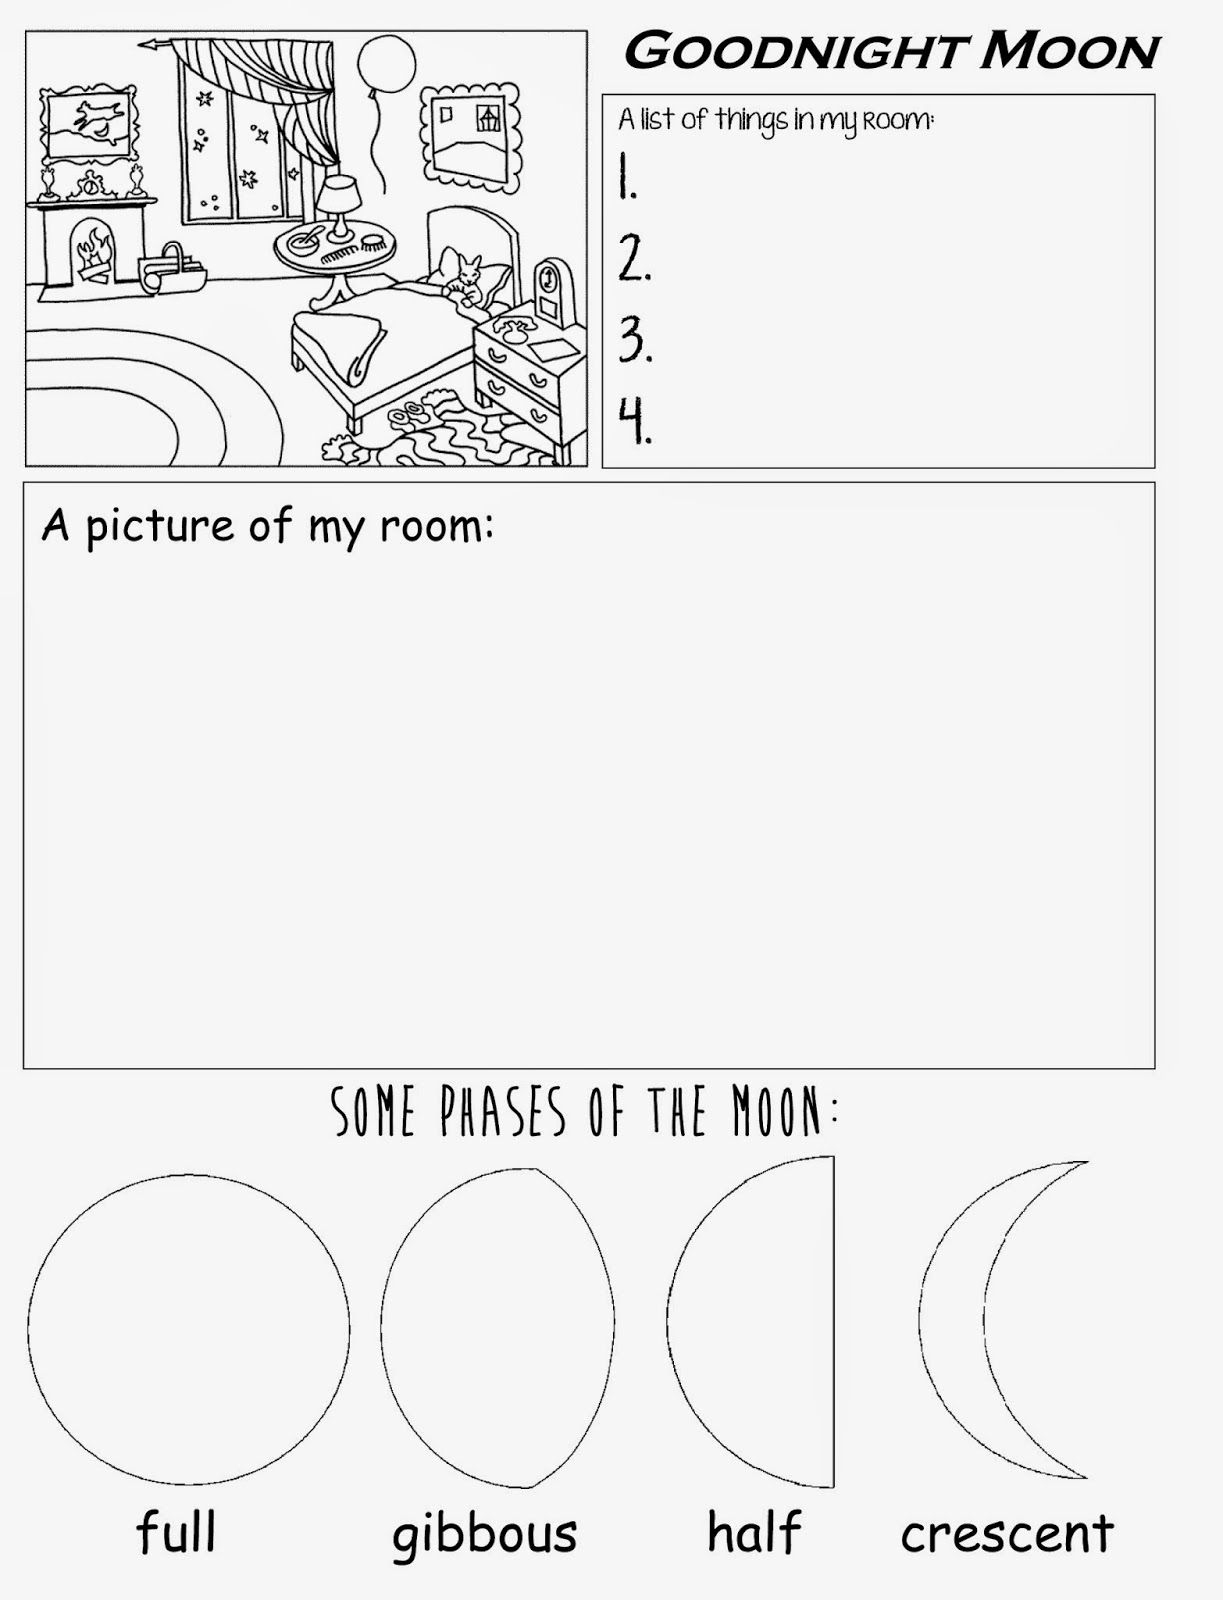 Goodnight Moon Free Printable Worksheet For Preschool Kindergarten | Phases Of The Moon Printable Worksheets